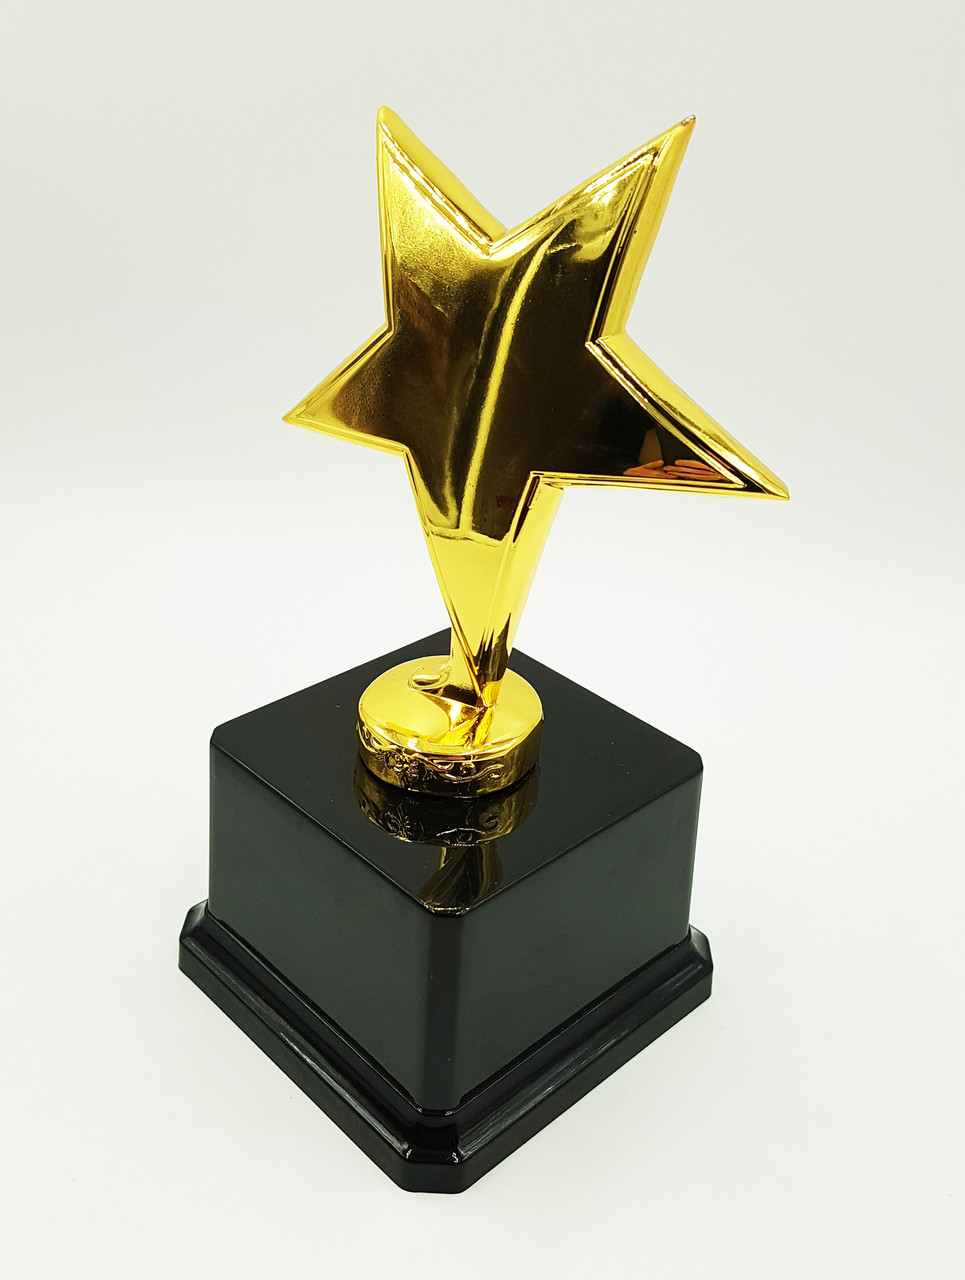 Наградная звезда на постаменте